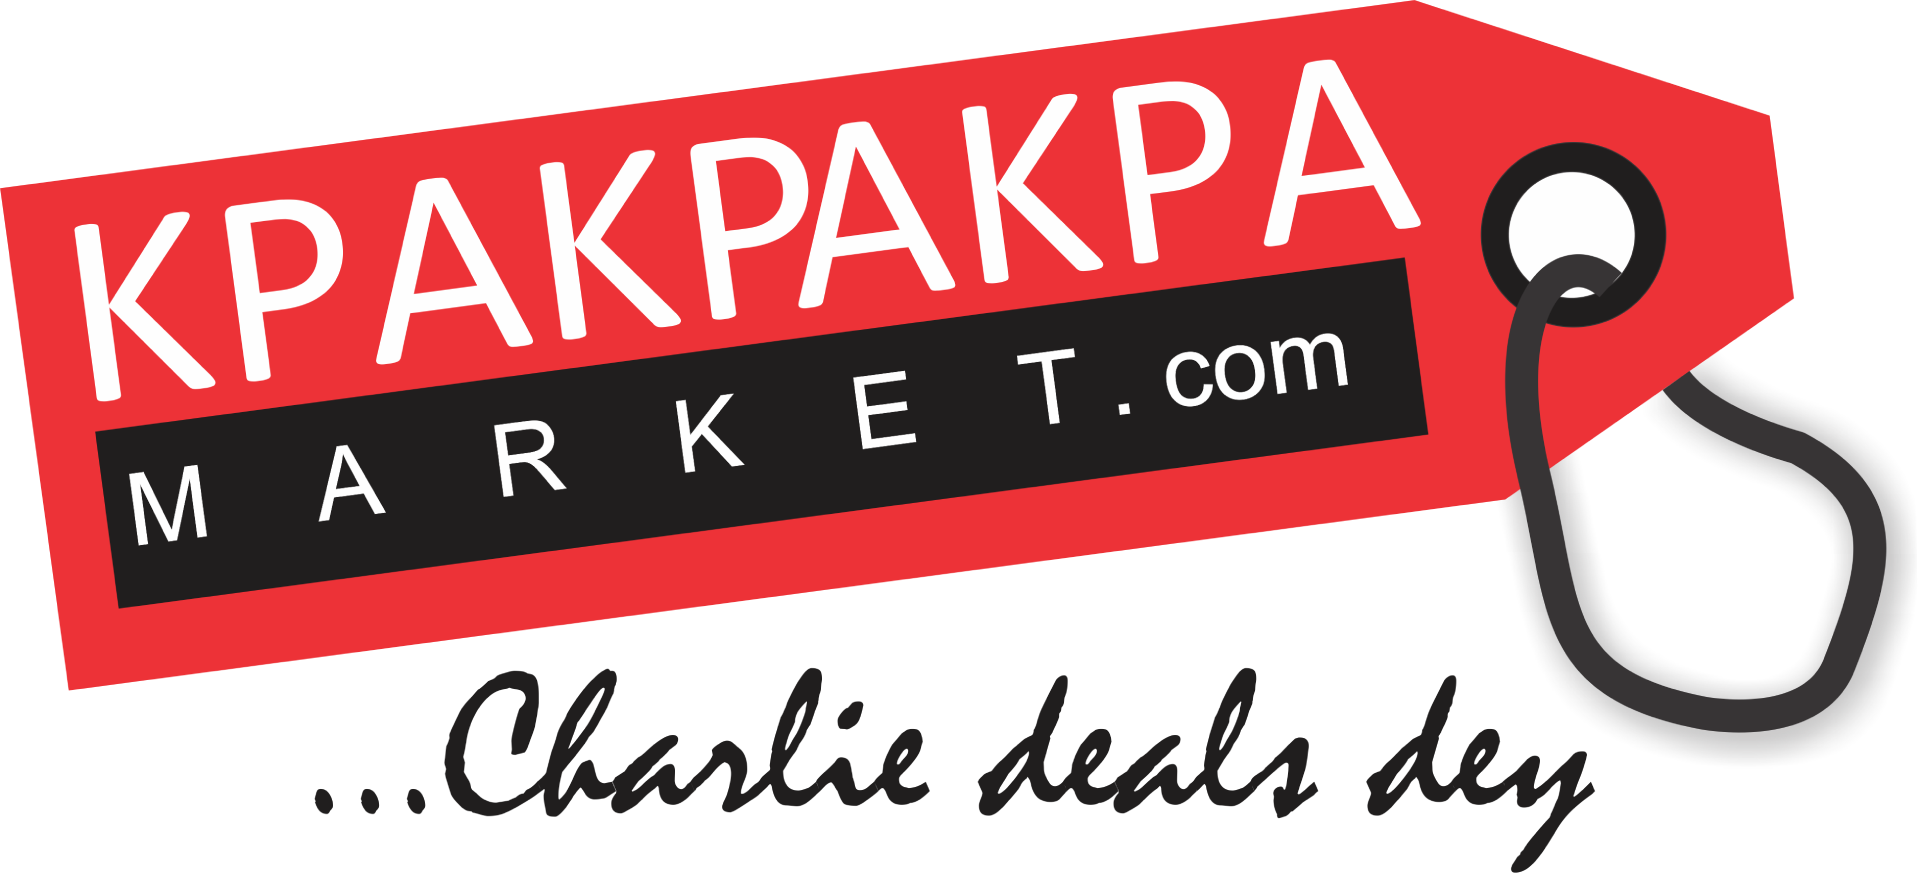 Kpakpakpa Market